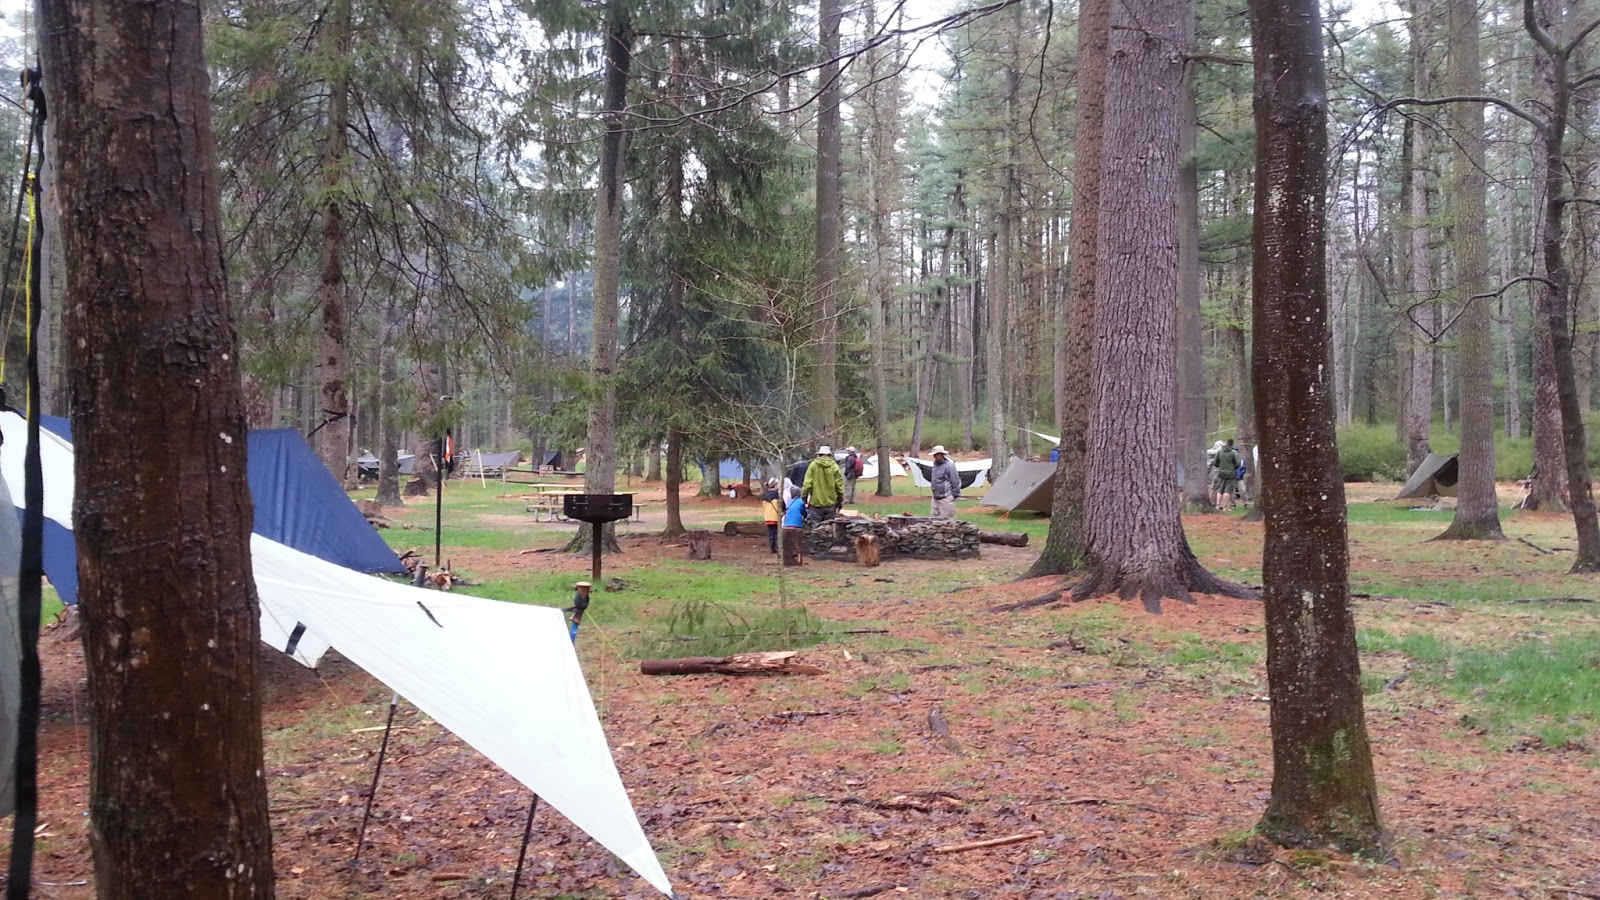 Appalachian Trail camping Mahha